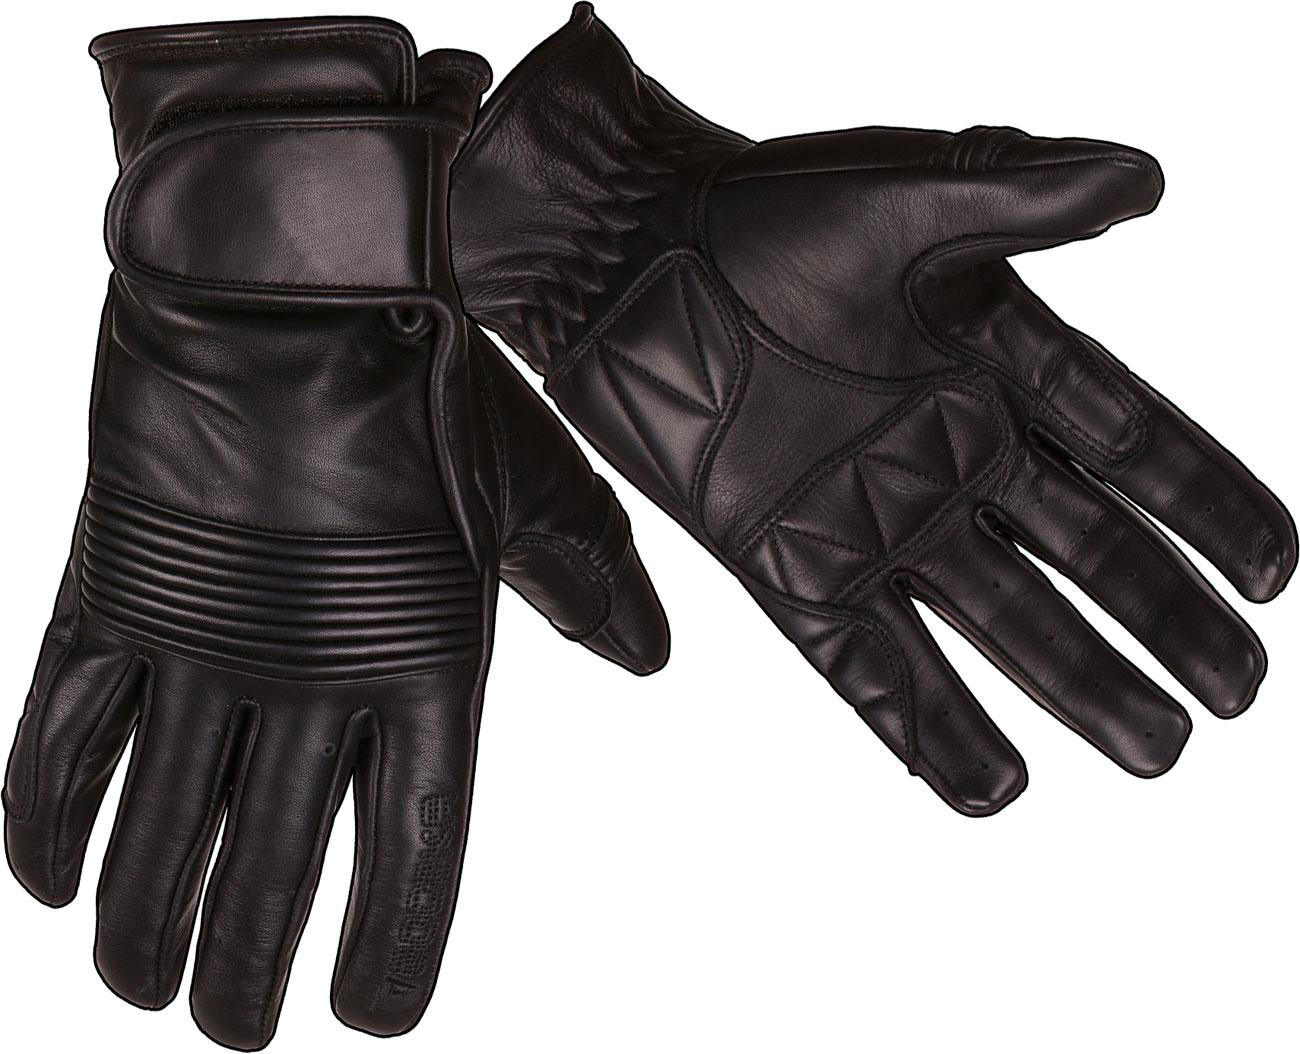 Modeka Gilroy, Handschuhe - Schwarz - 12 074260-10-12